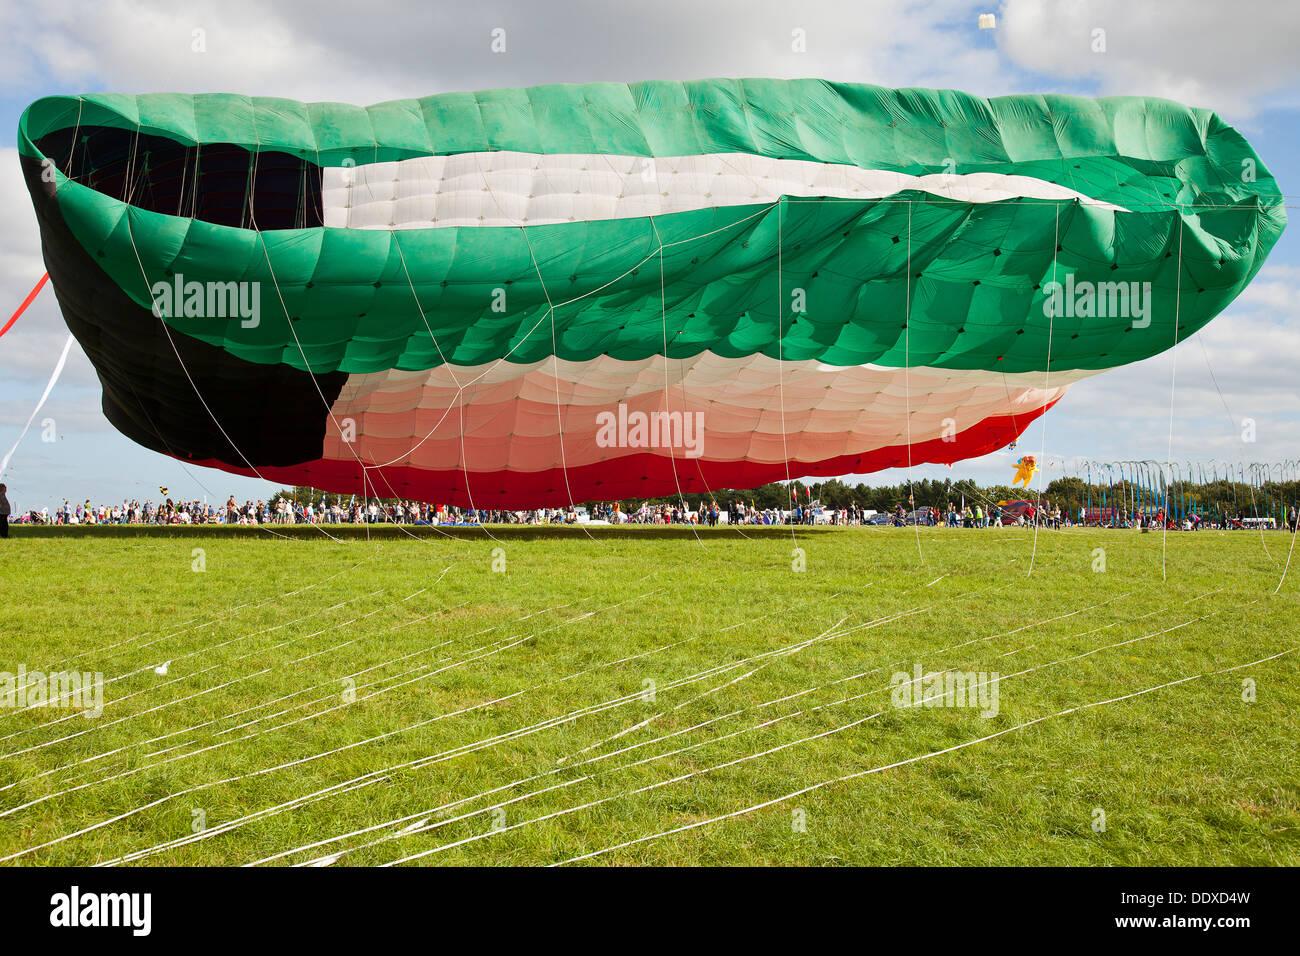 The world's biggest kite, based on the Kuwaiti national flag, flying at the Bristol International Kite Festival 2013 - Stock Image